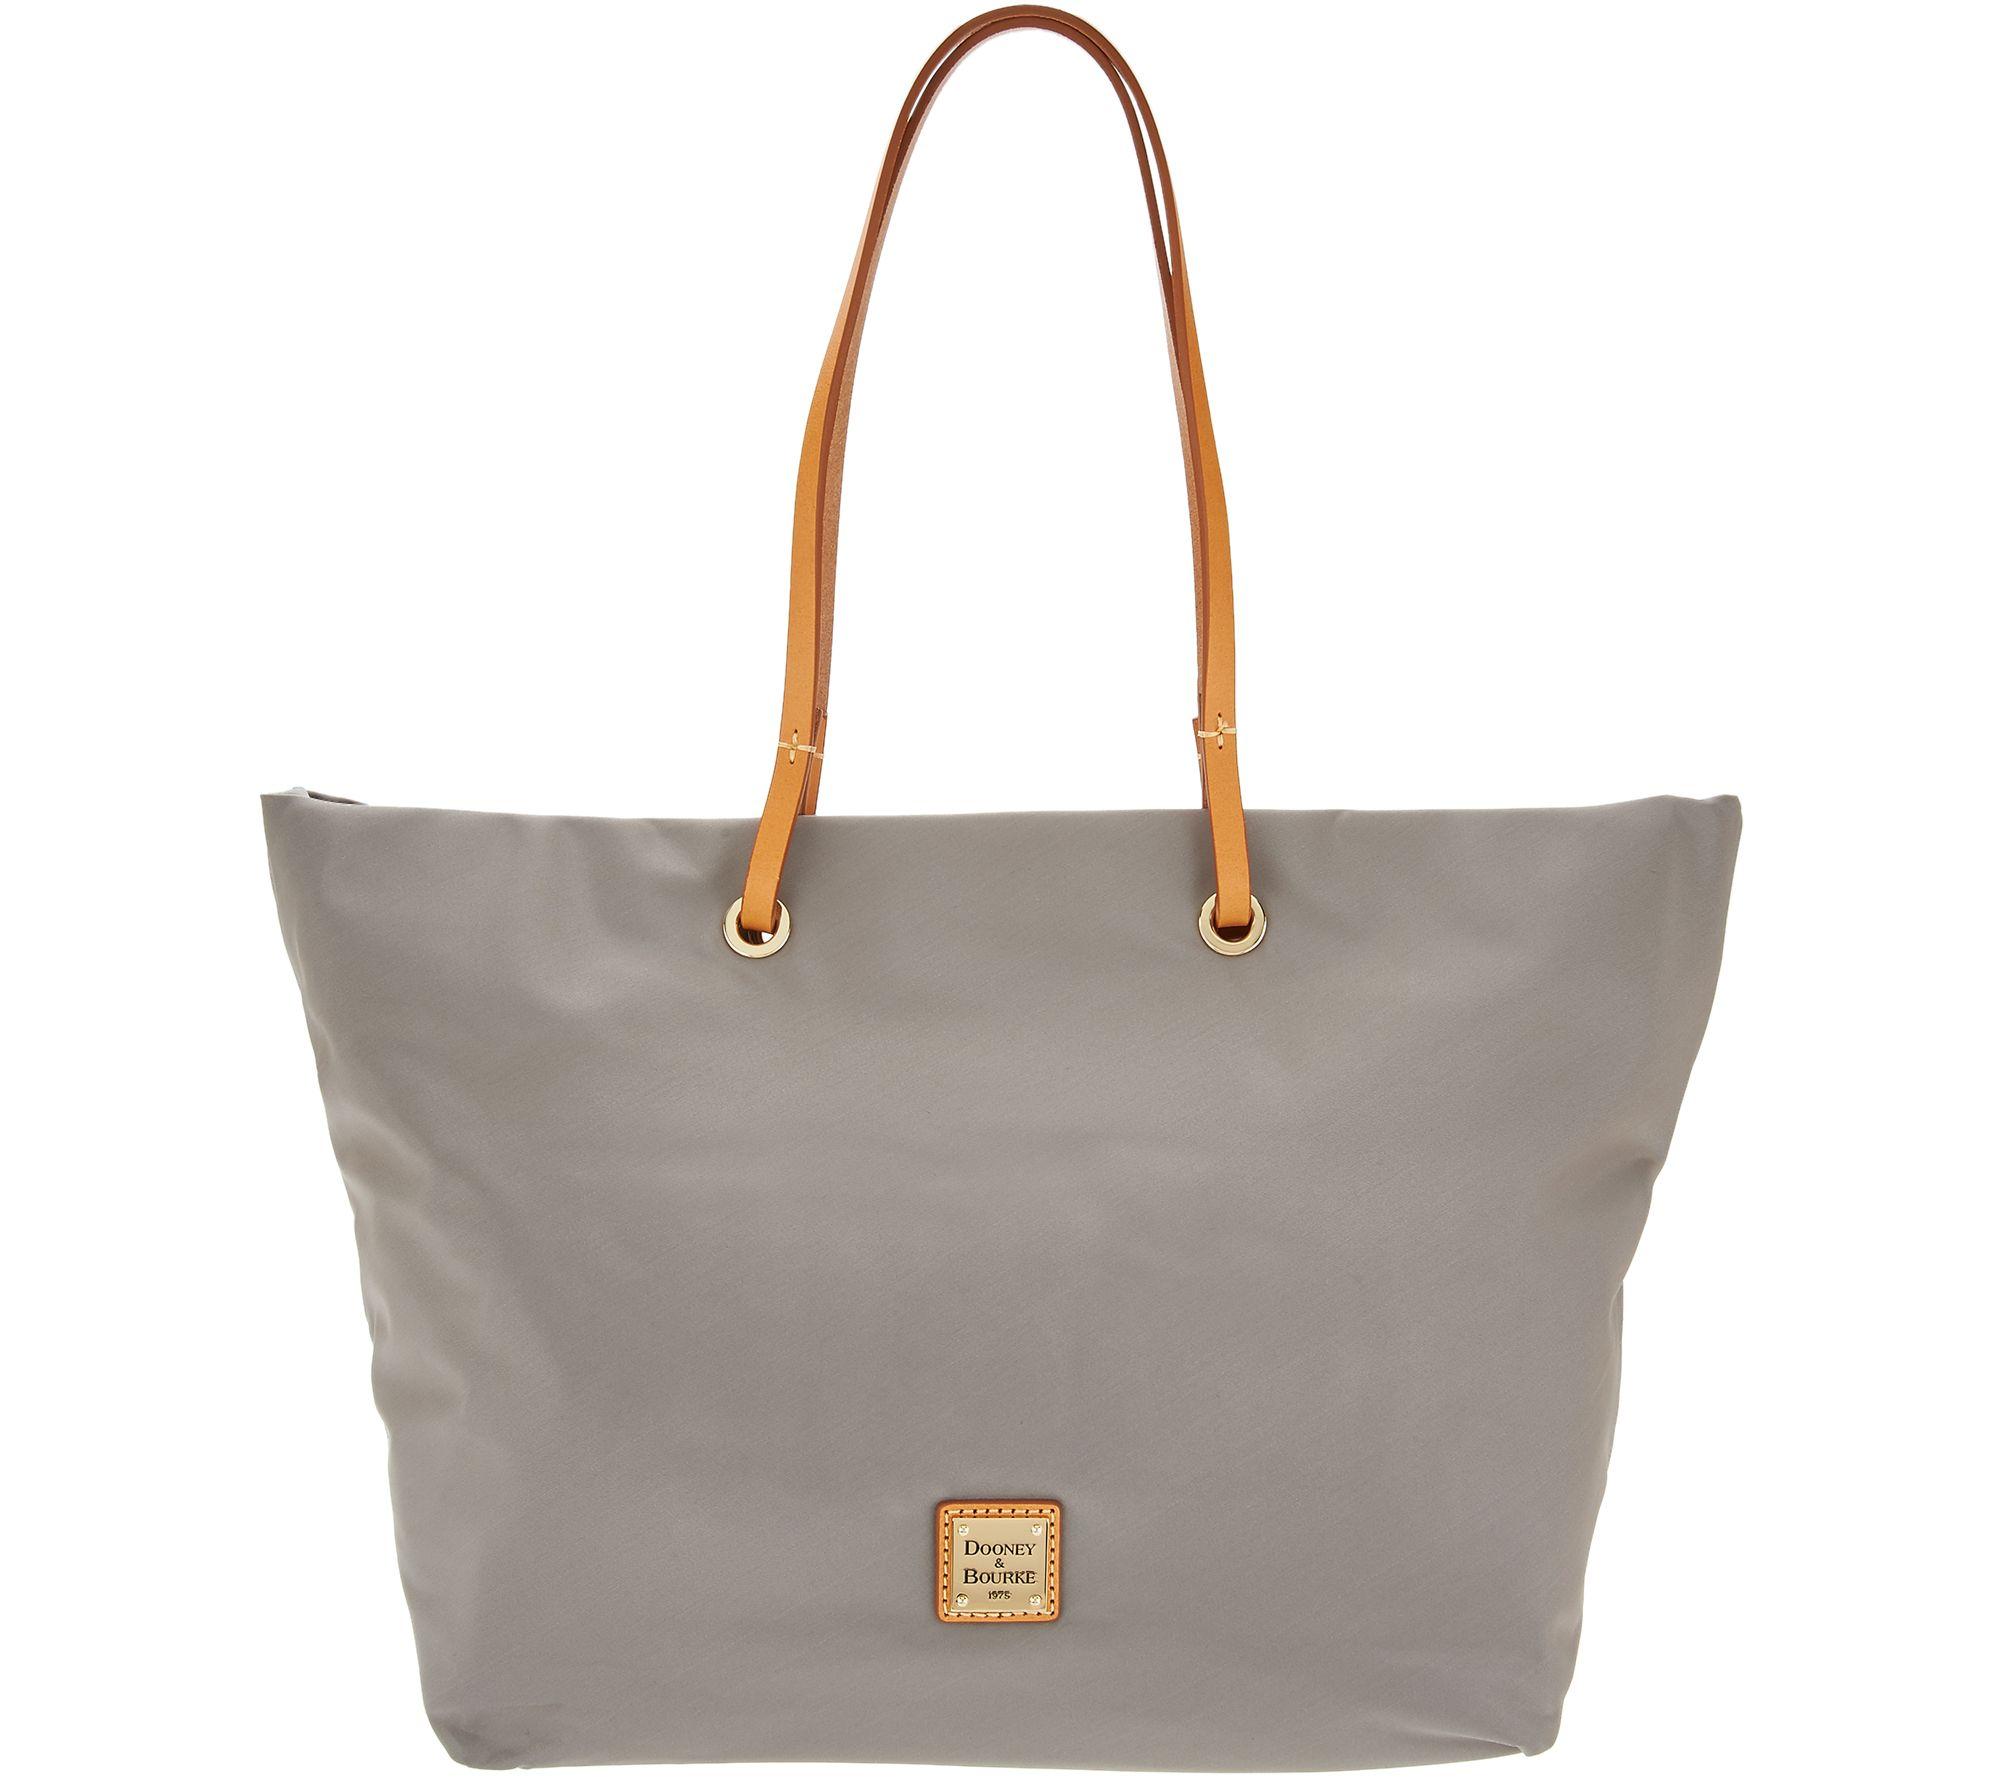 a1d74acc8d1b Dooney & Bourke Miramar Nylon Tote Handbag- Addison - Page 1 — QVC.com